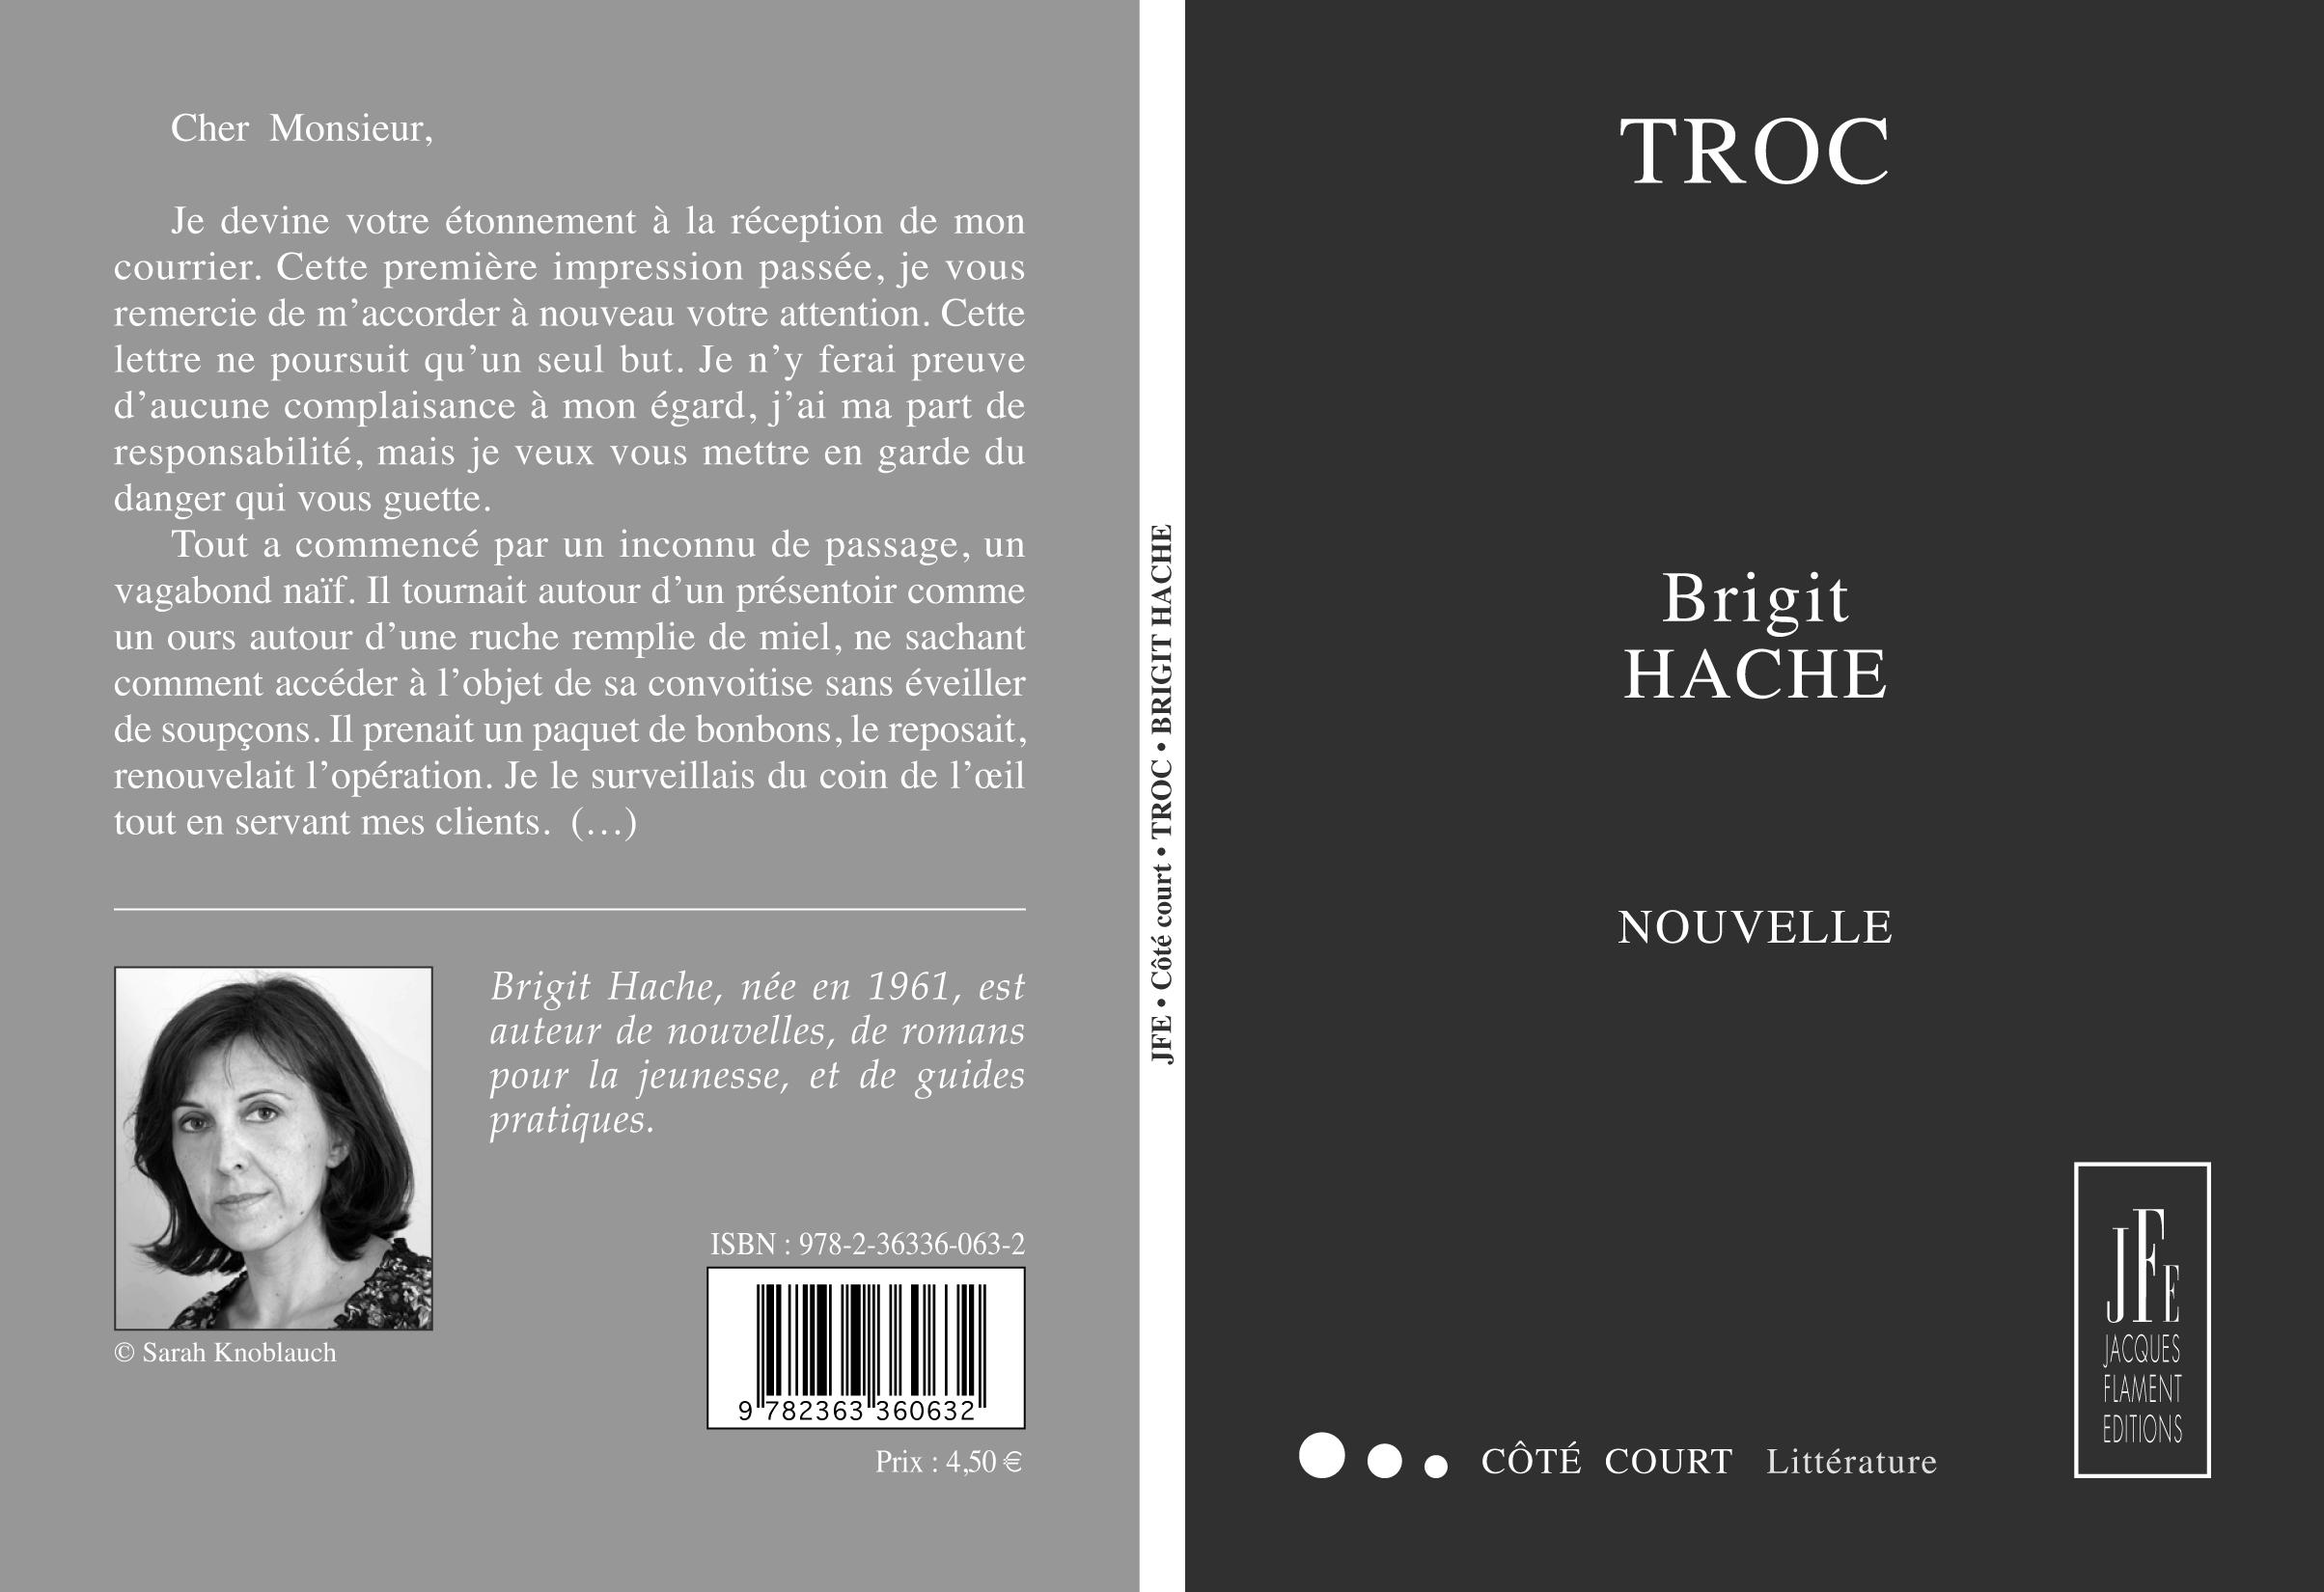 Troc Brigitte Hache